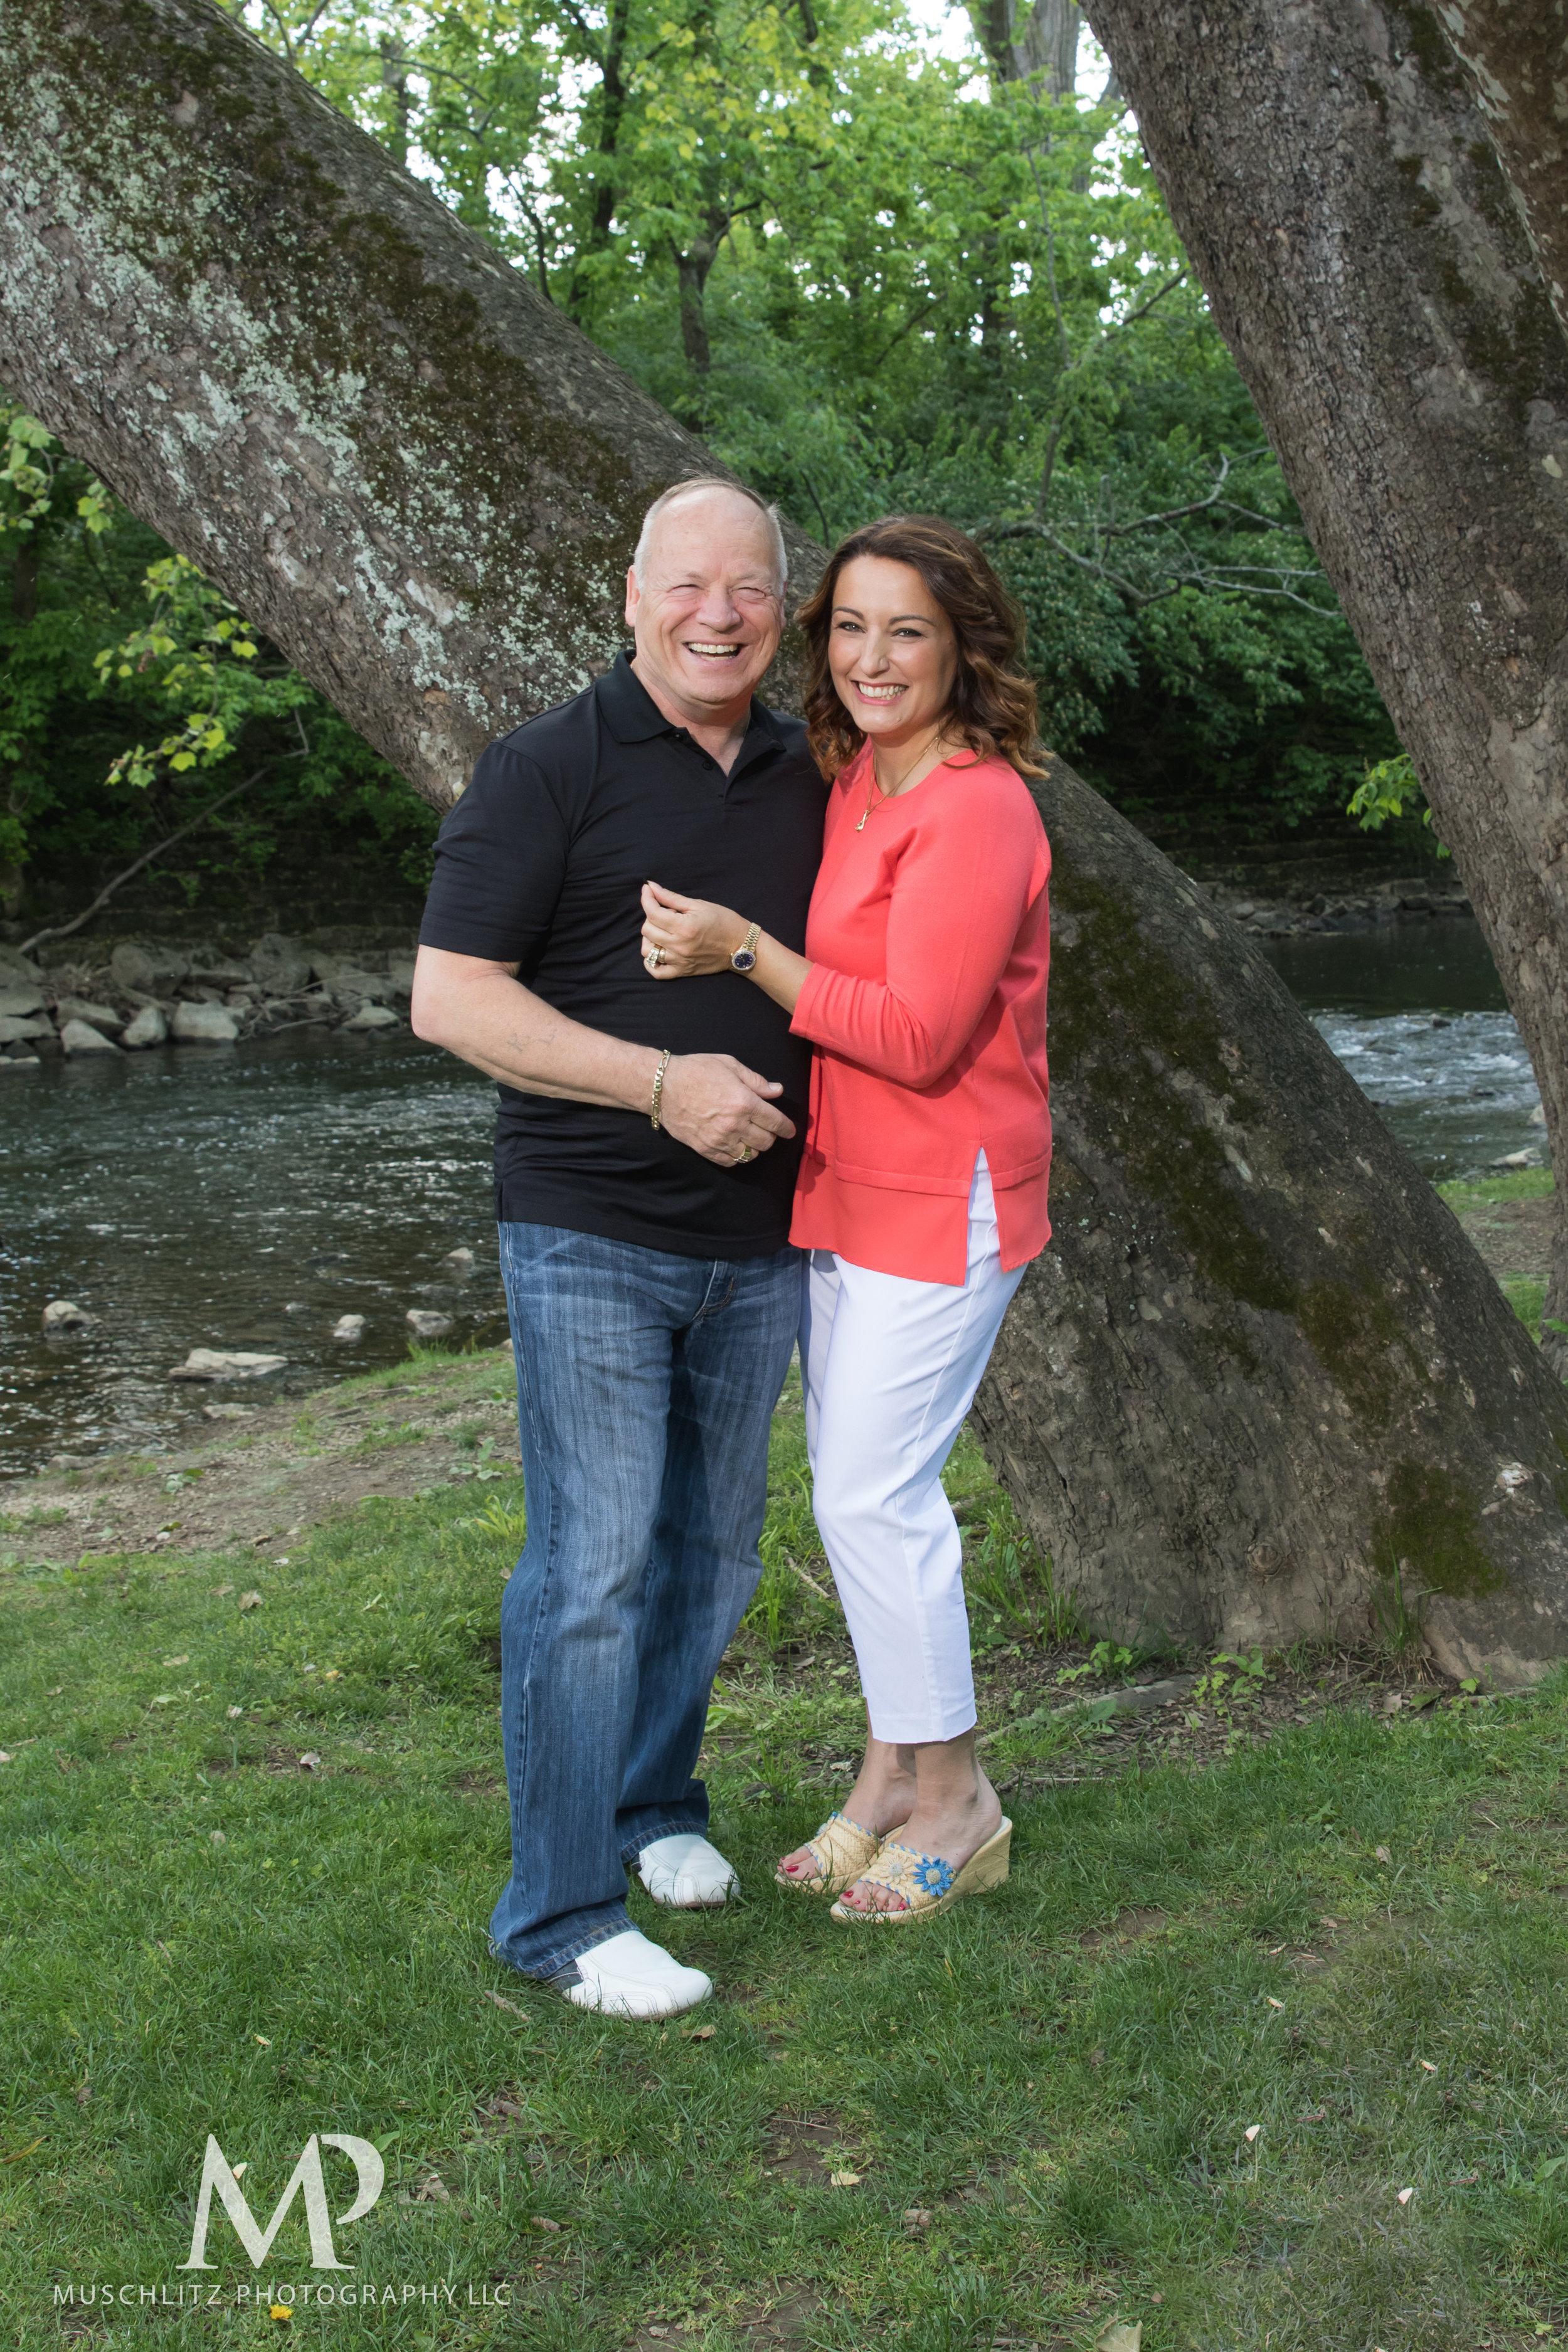 anniversary-couple-portrait-session-creekside-park-plaza-gahanna-ohio-boxer-dog-muschlitz-photography-017.JPG